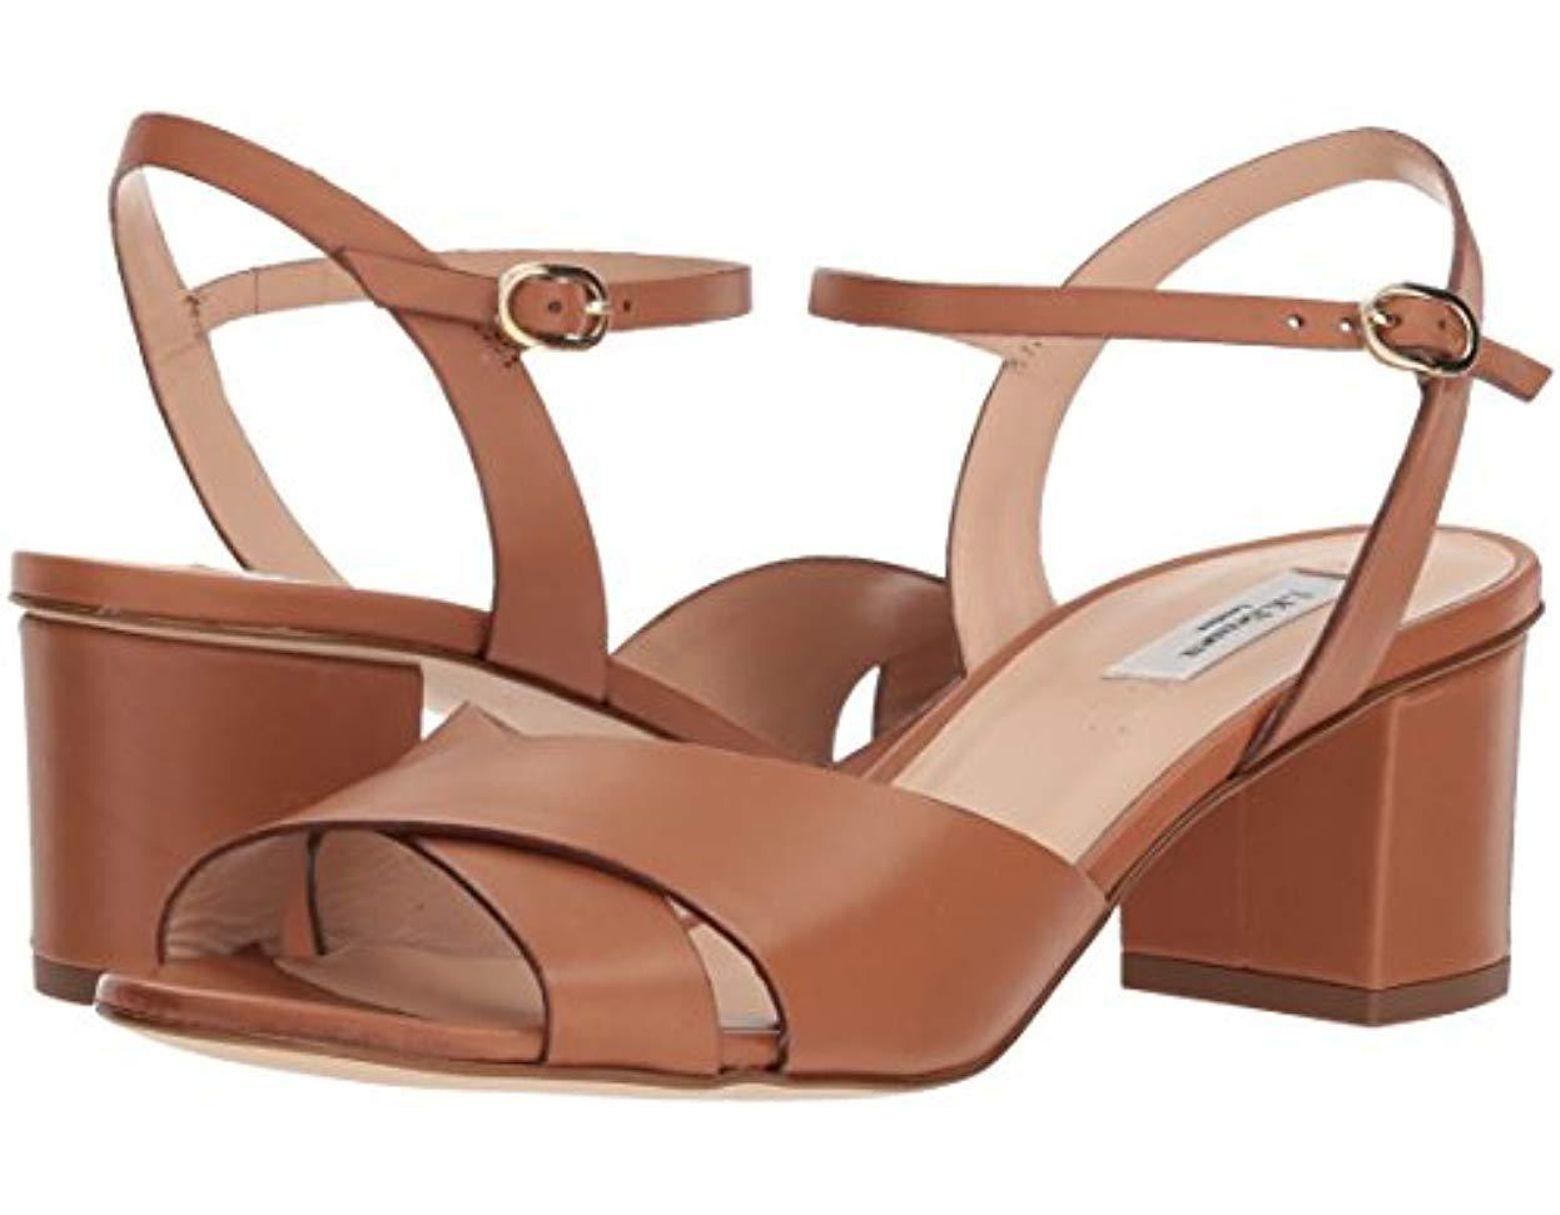 d2ecd55159f0 Lyst - L.K.Bennett Tabitha Heeled Sandal in Brown - Save 65%